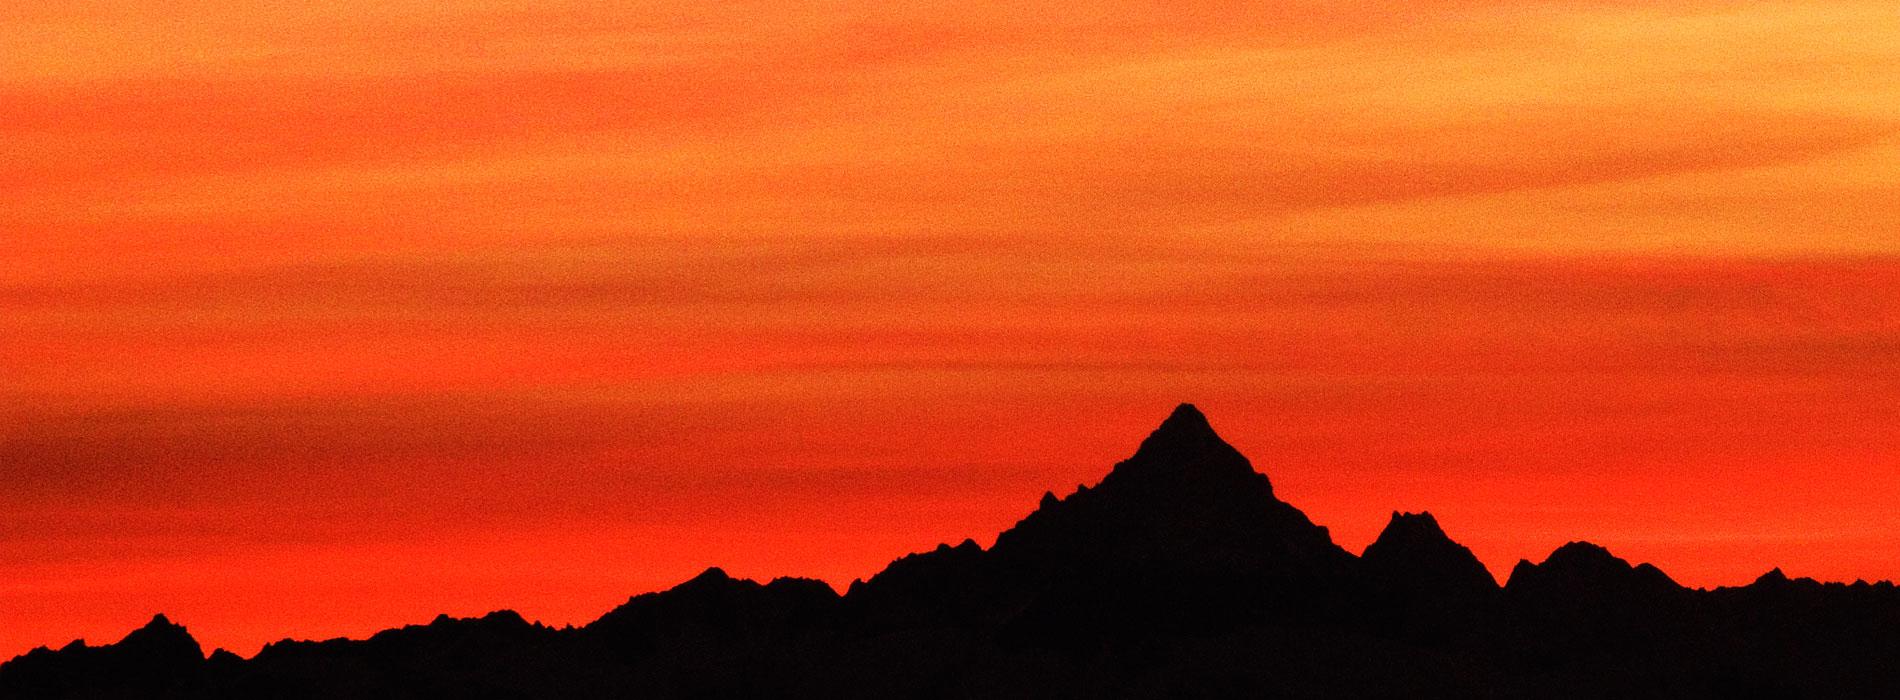 02_tramonto